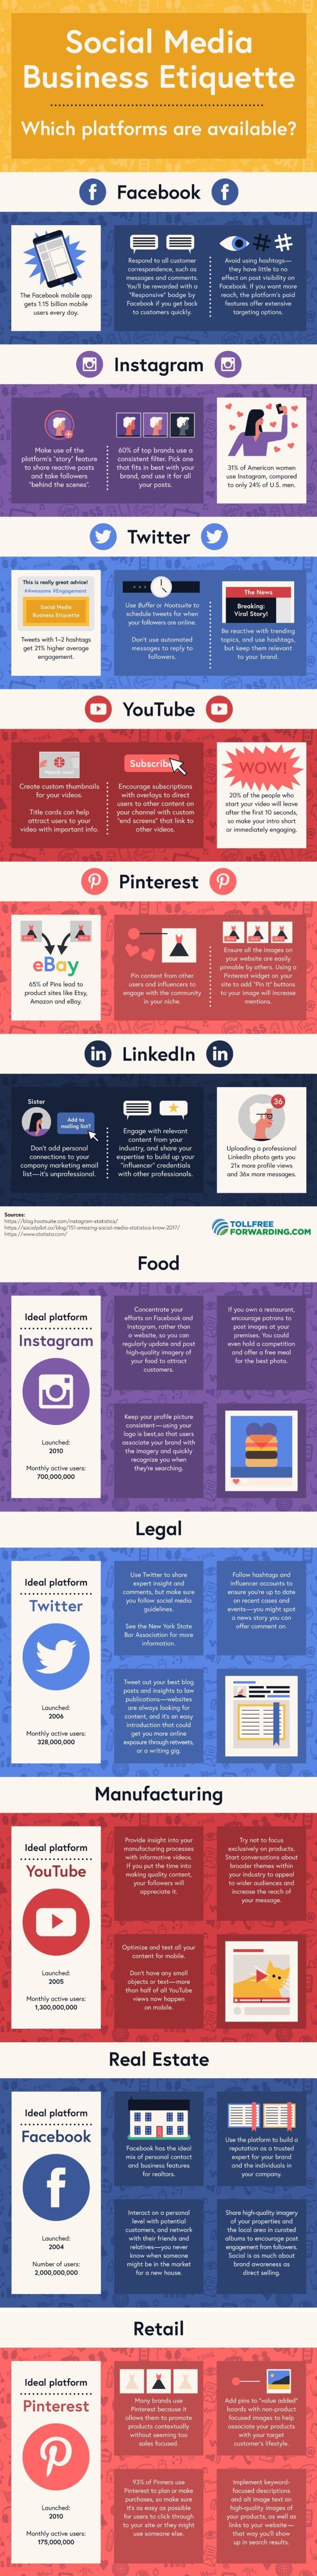 Following Proper Social Media Etiquette -- An Infographic